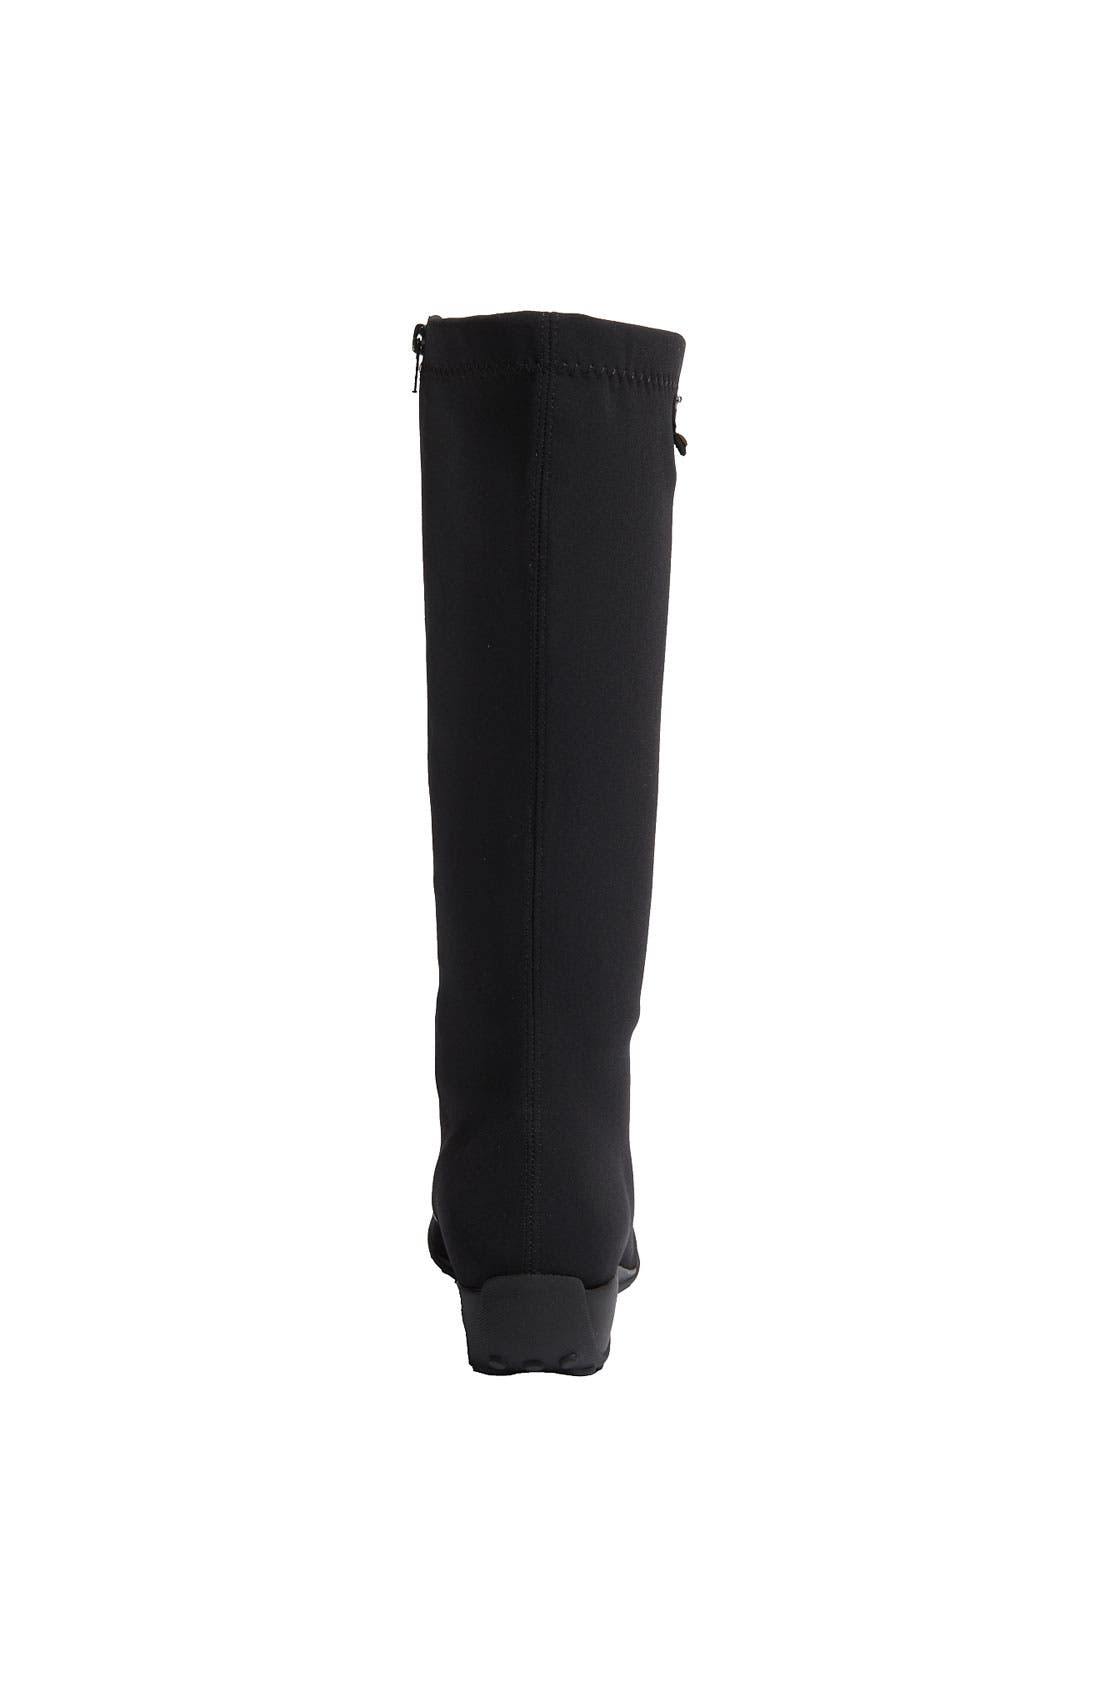 Alternate Image 4  - Mephisto 'Linda' Waterproof Stretch Boot